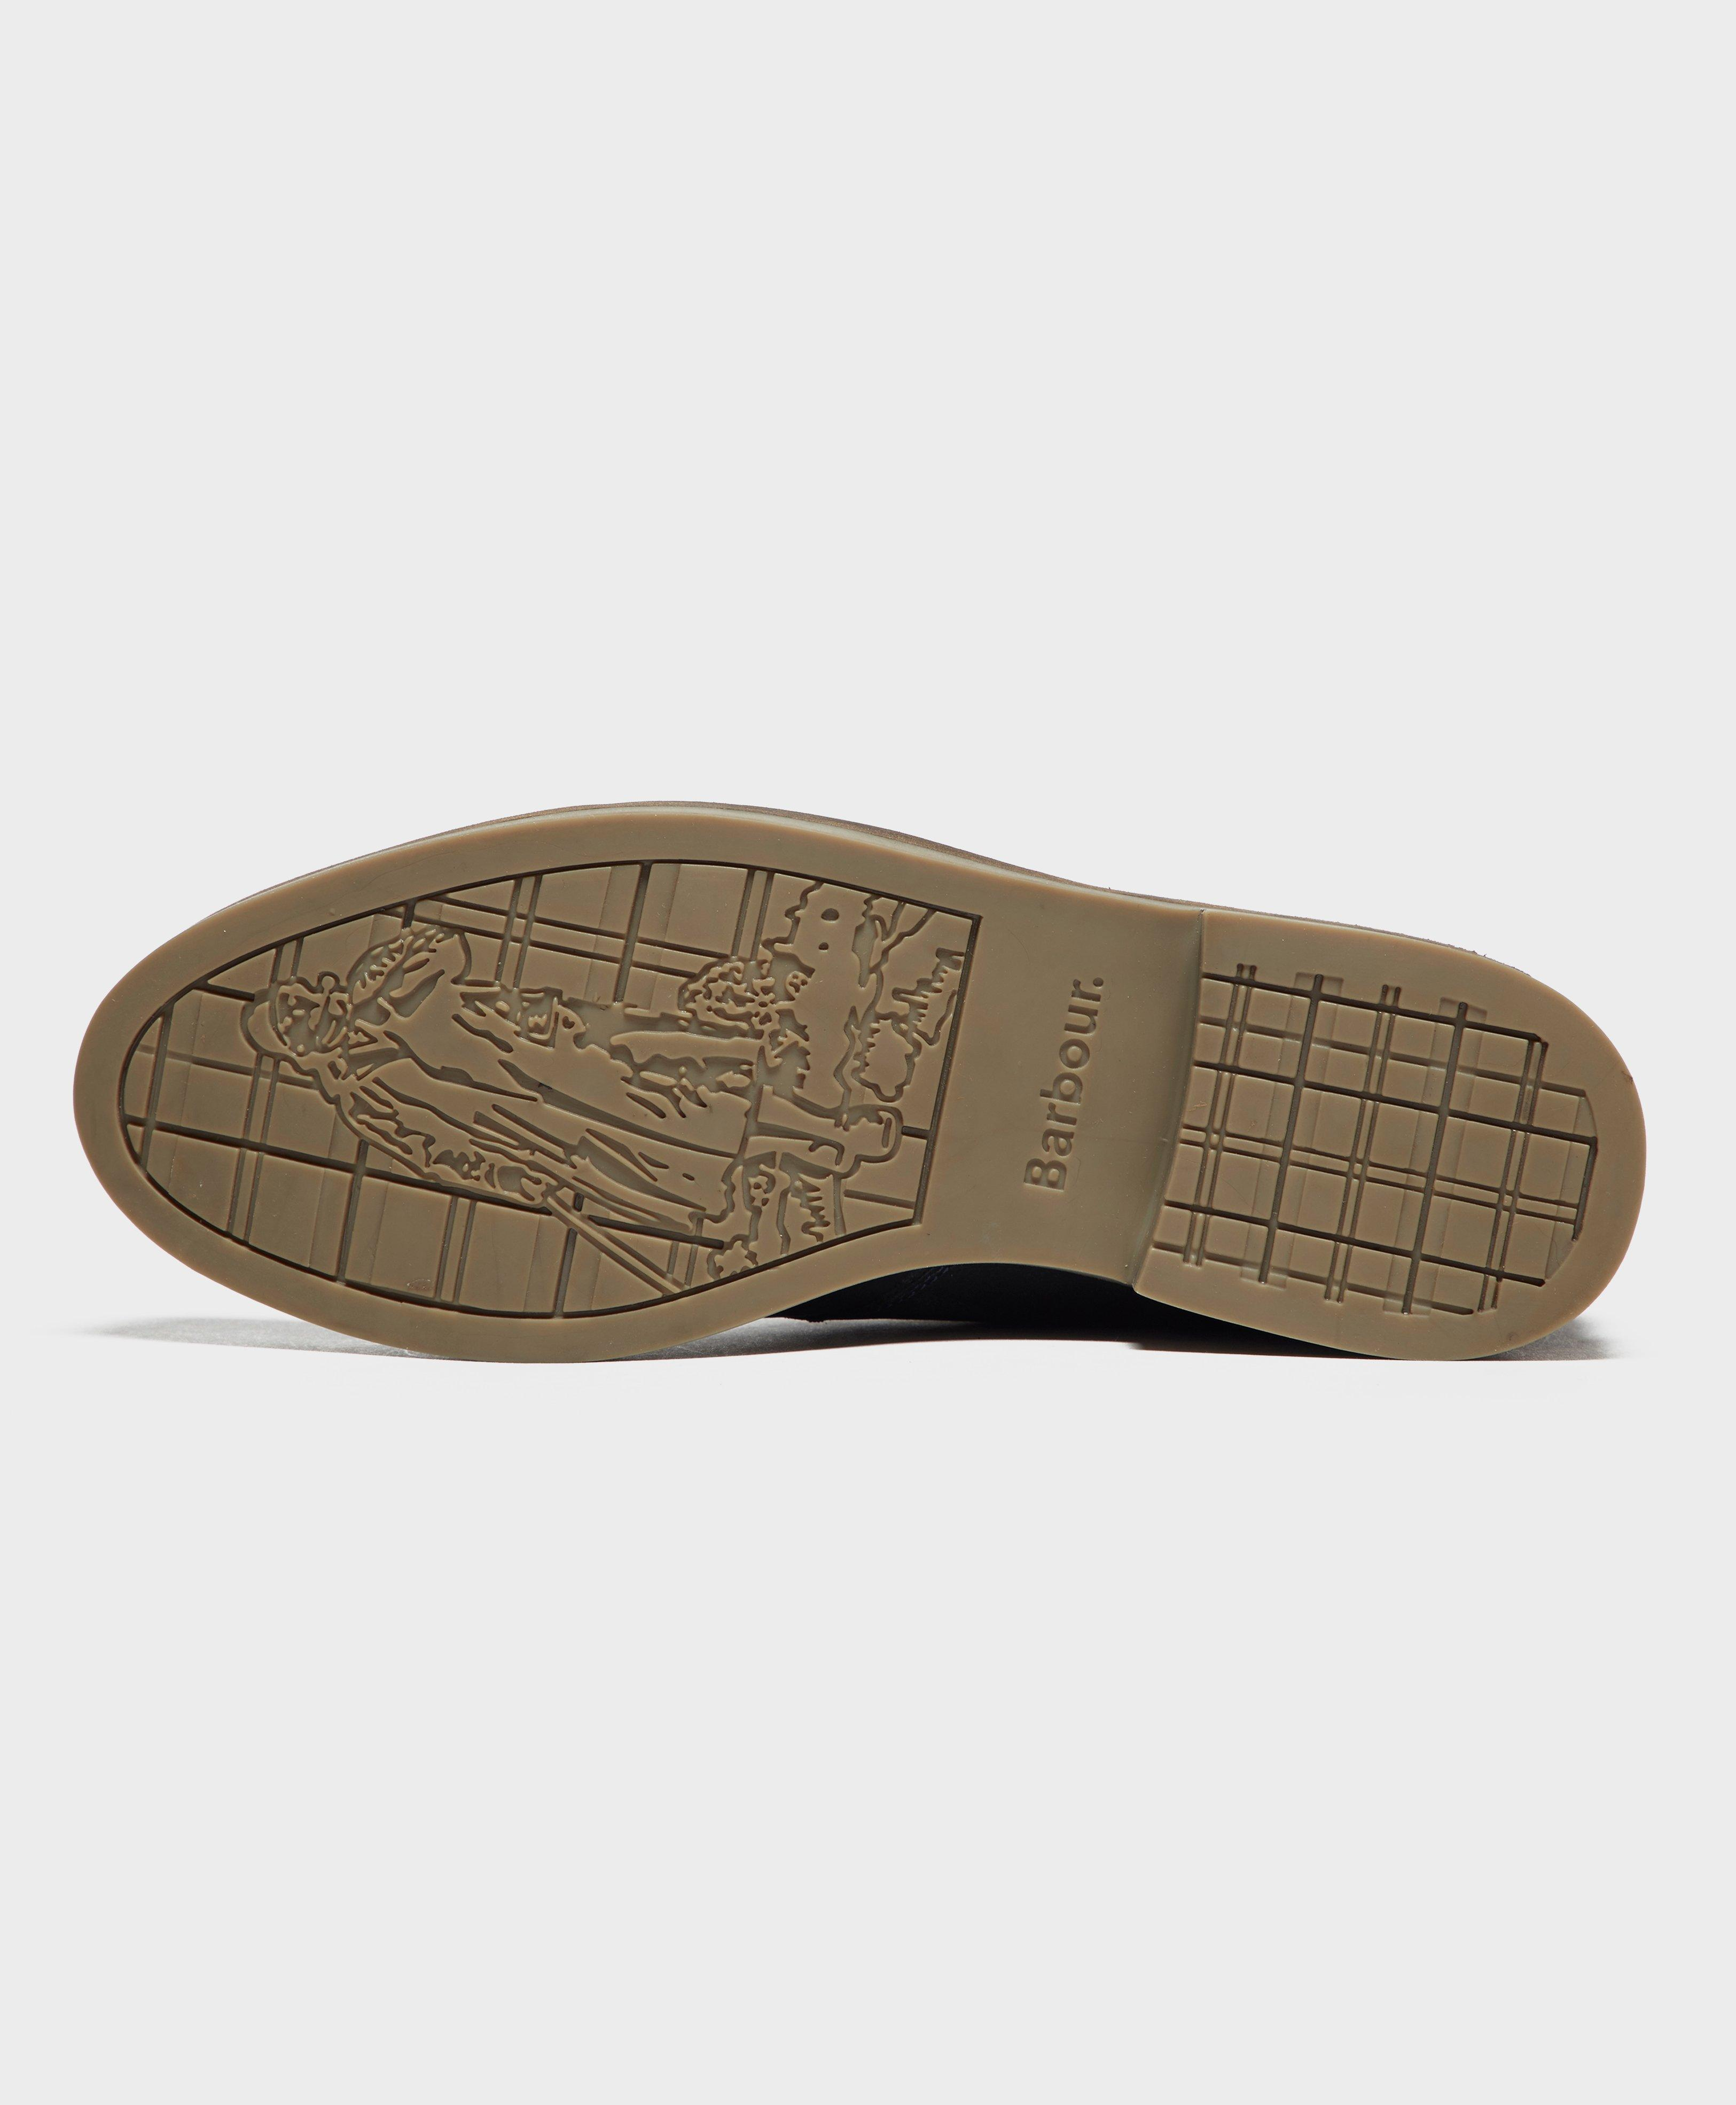 d6516f0f637 Lyst - Barbour Readhead Boot for Men